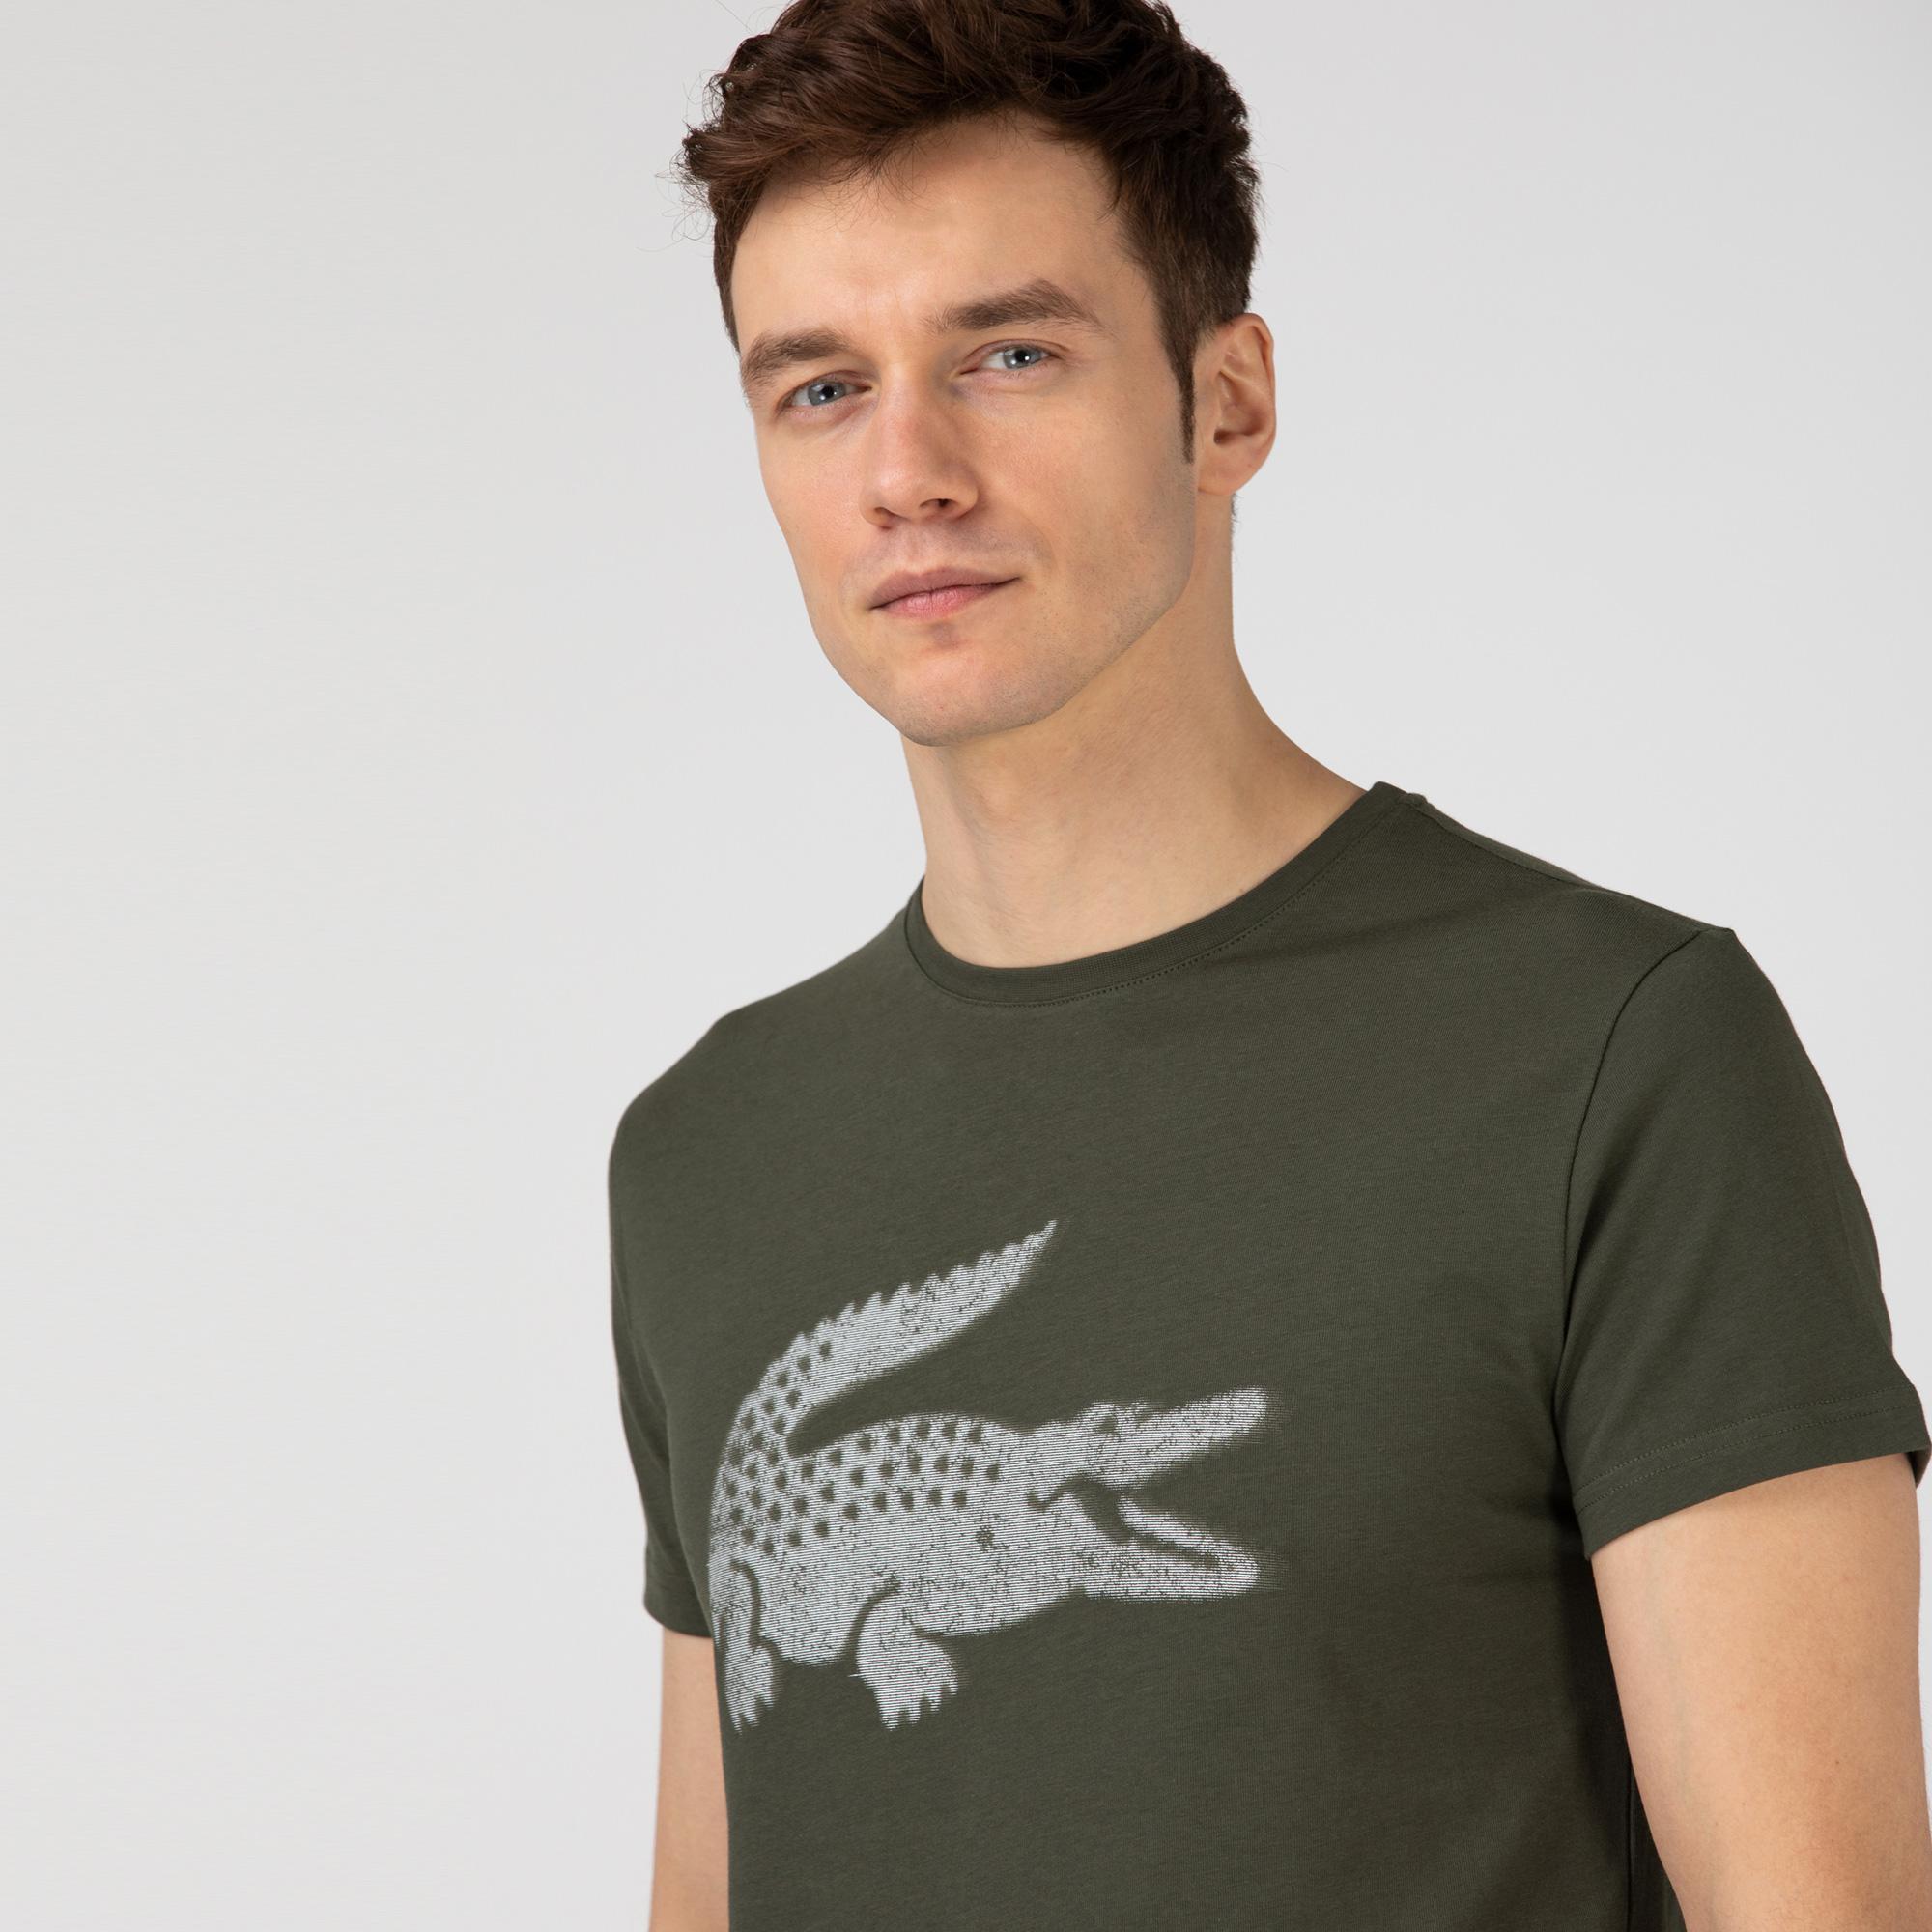 Lacoste Erkek Slim Fit Bisiklet Yaka Baskılı Haki T-Shirt